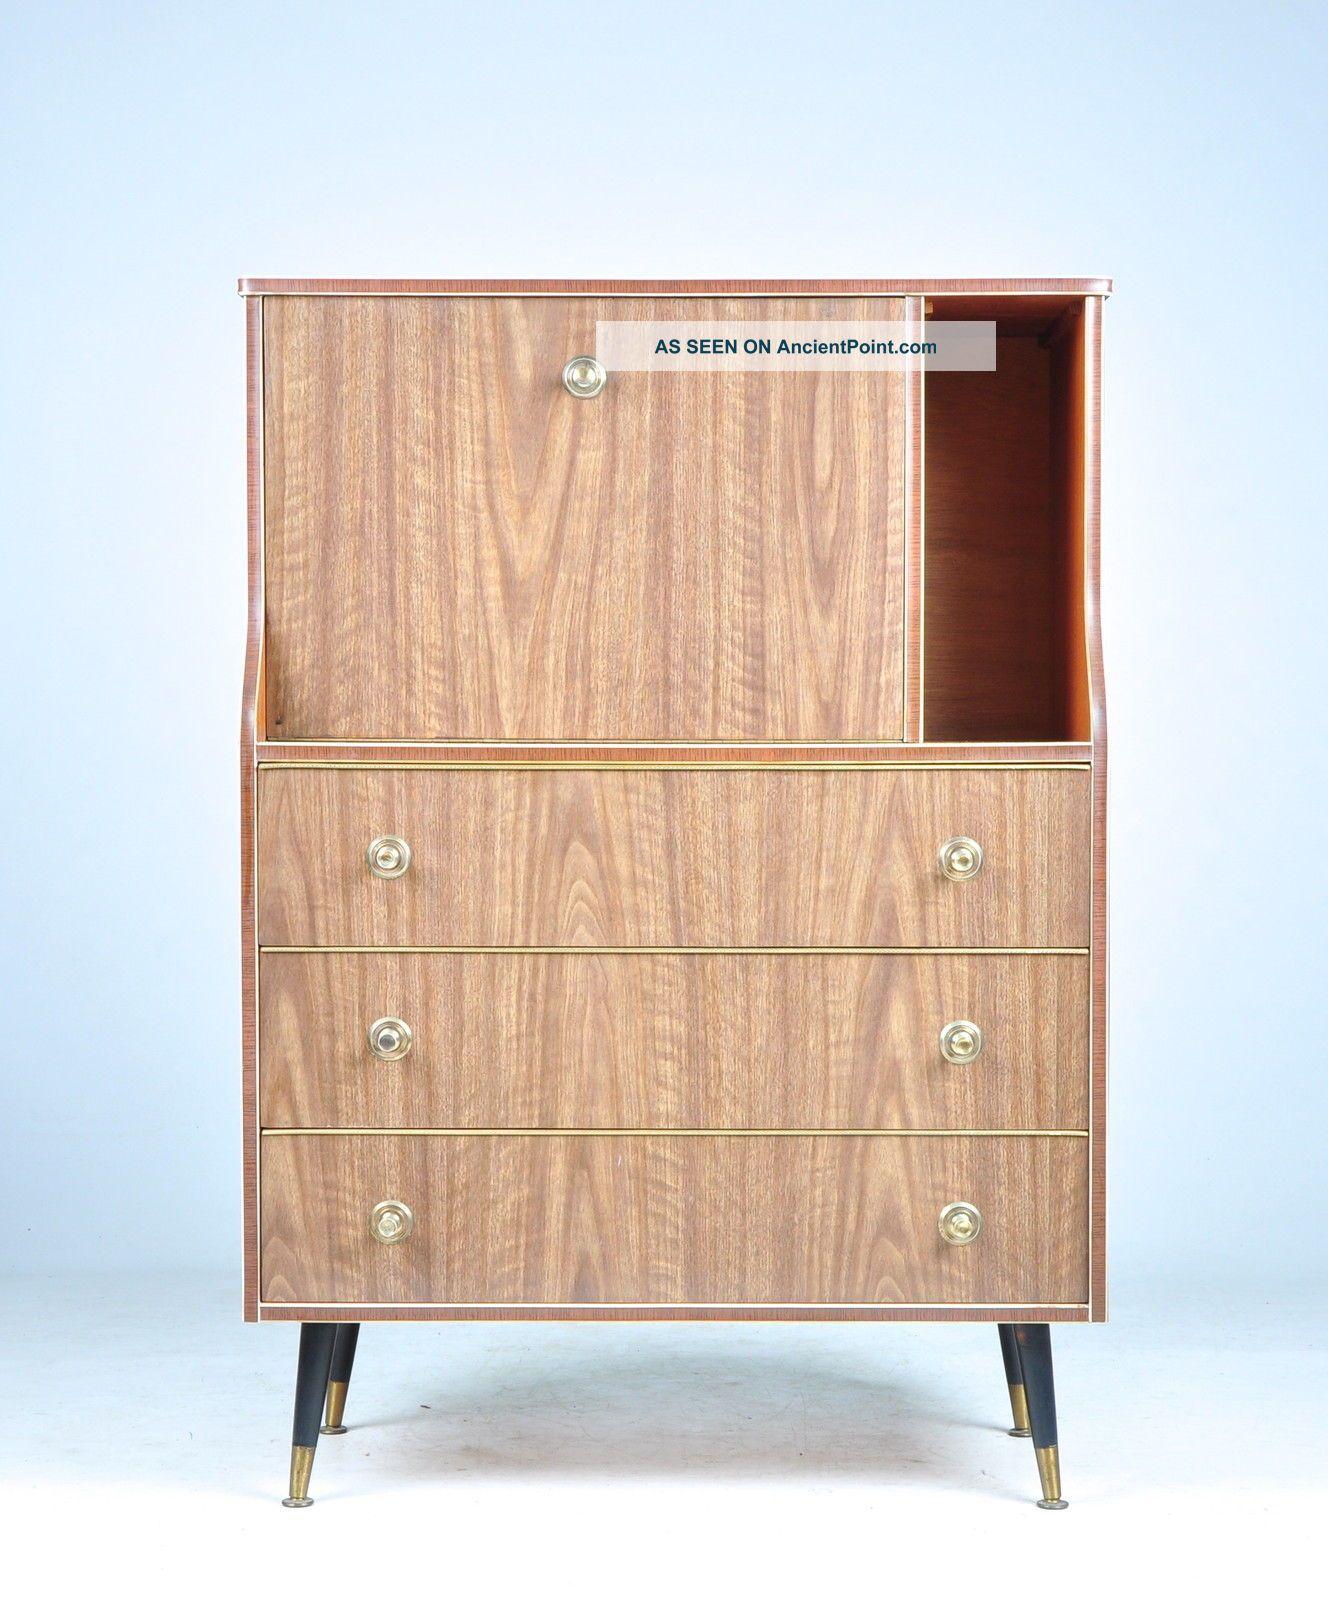 Retro Vintage Writing Bureau Desk Mid Century Formica Laminate 1950s 60s 20th Century photo